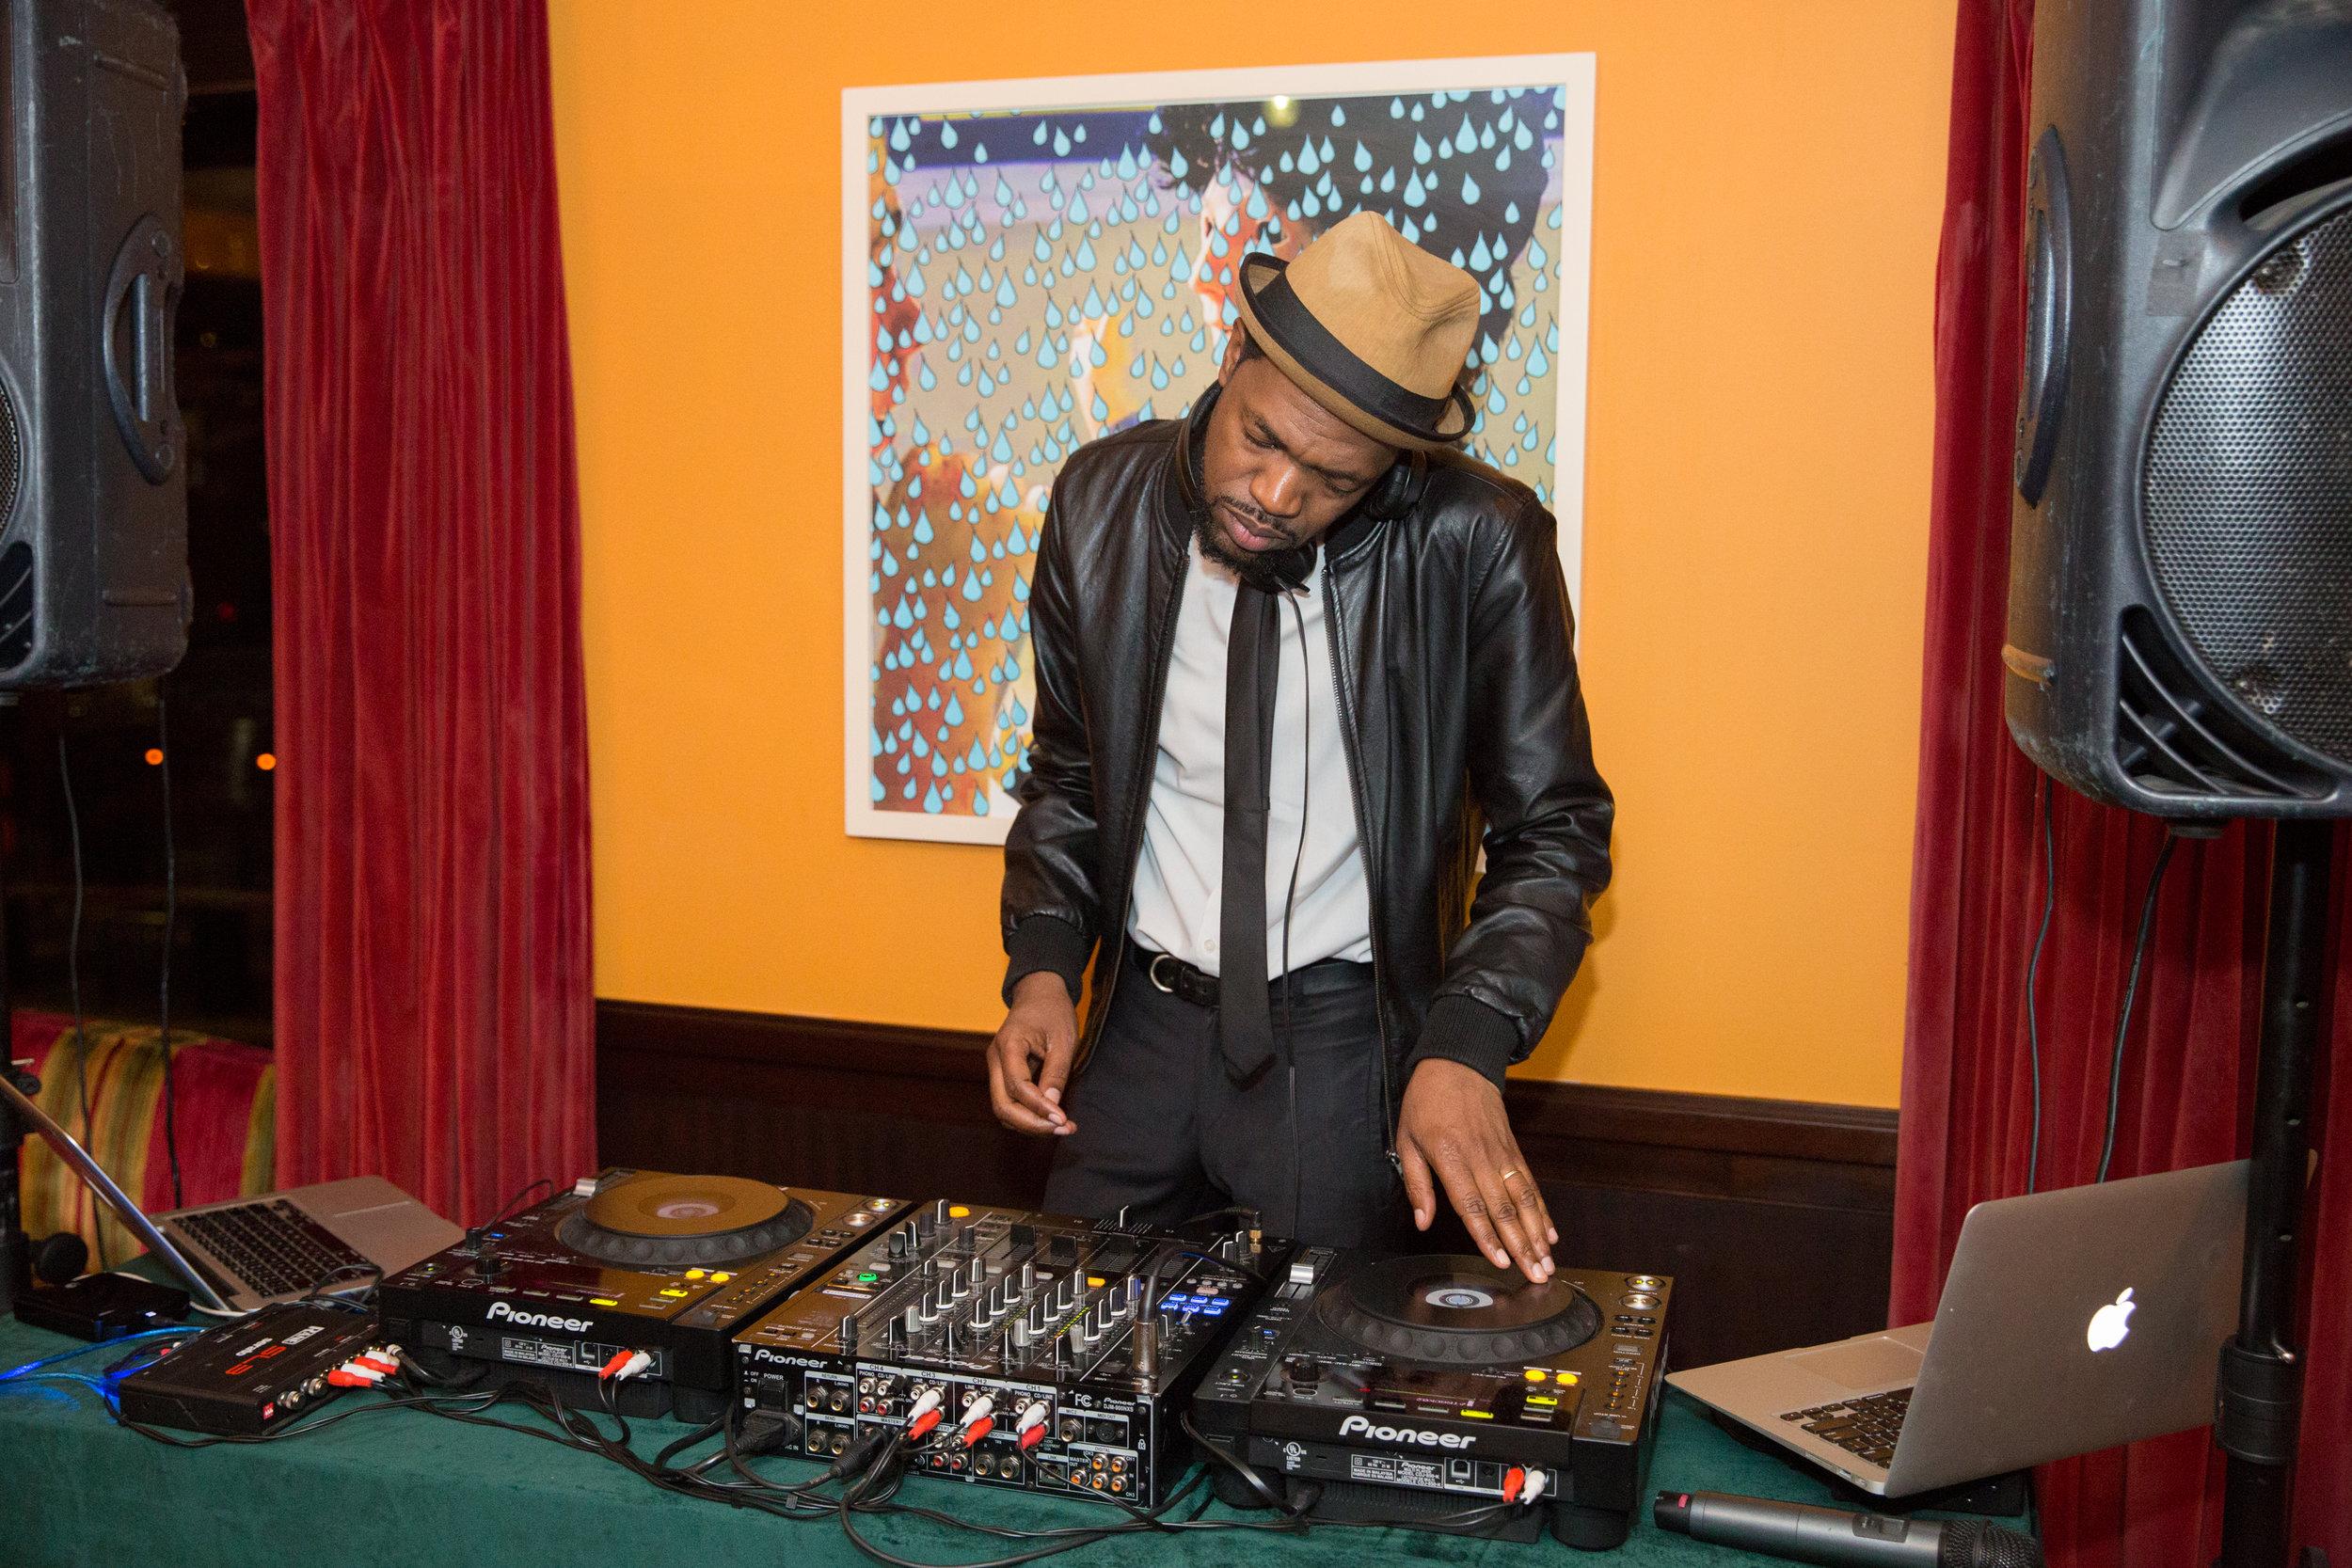 Gramercy-Park-Hotel-Holiday-Party-Andrea-Freeman-Events-11.JPG